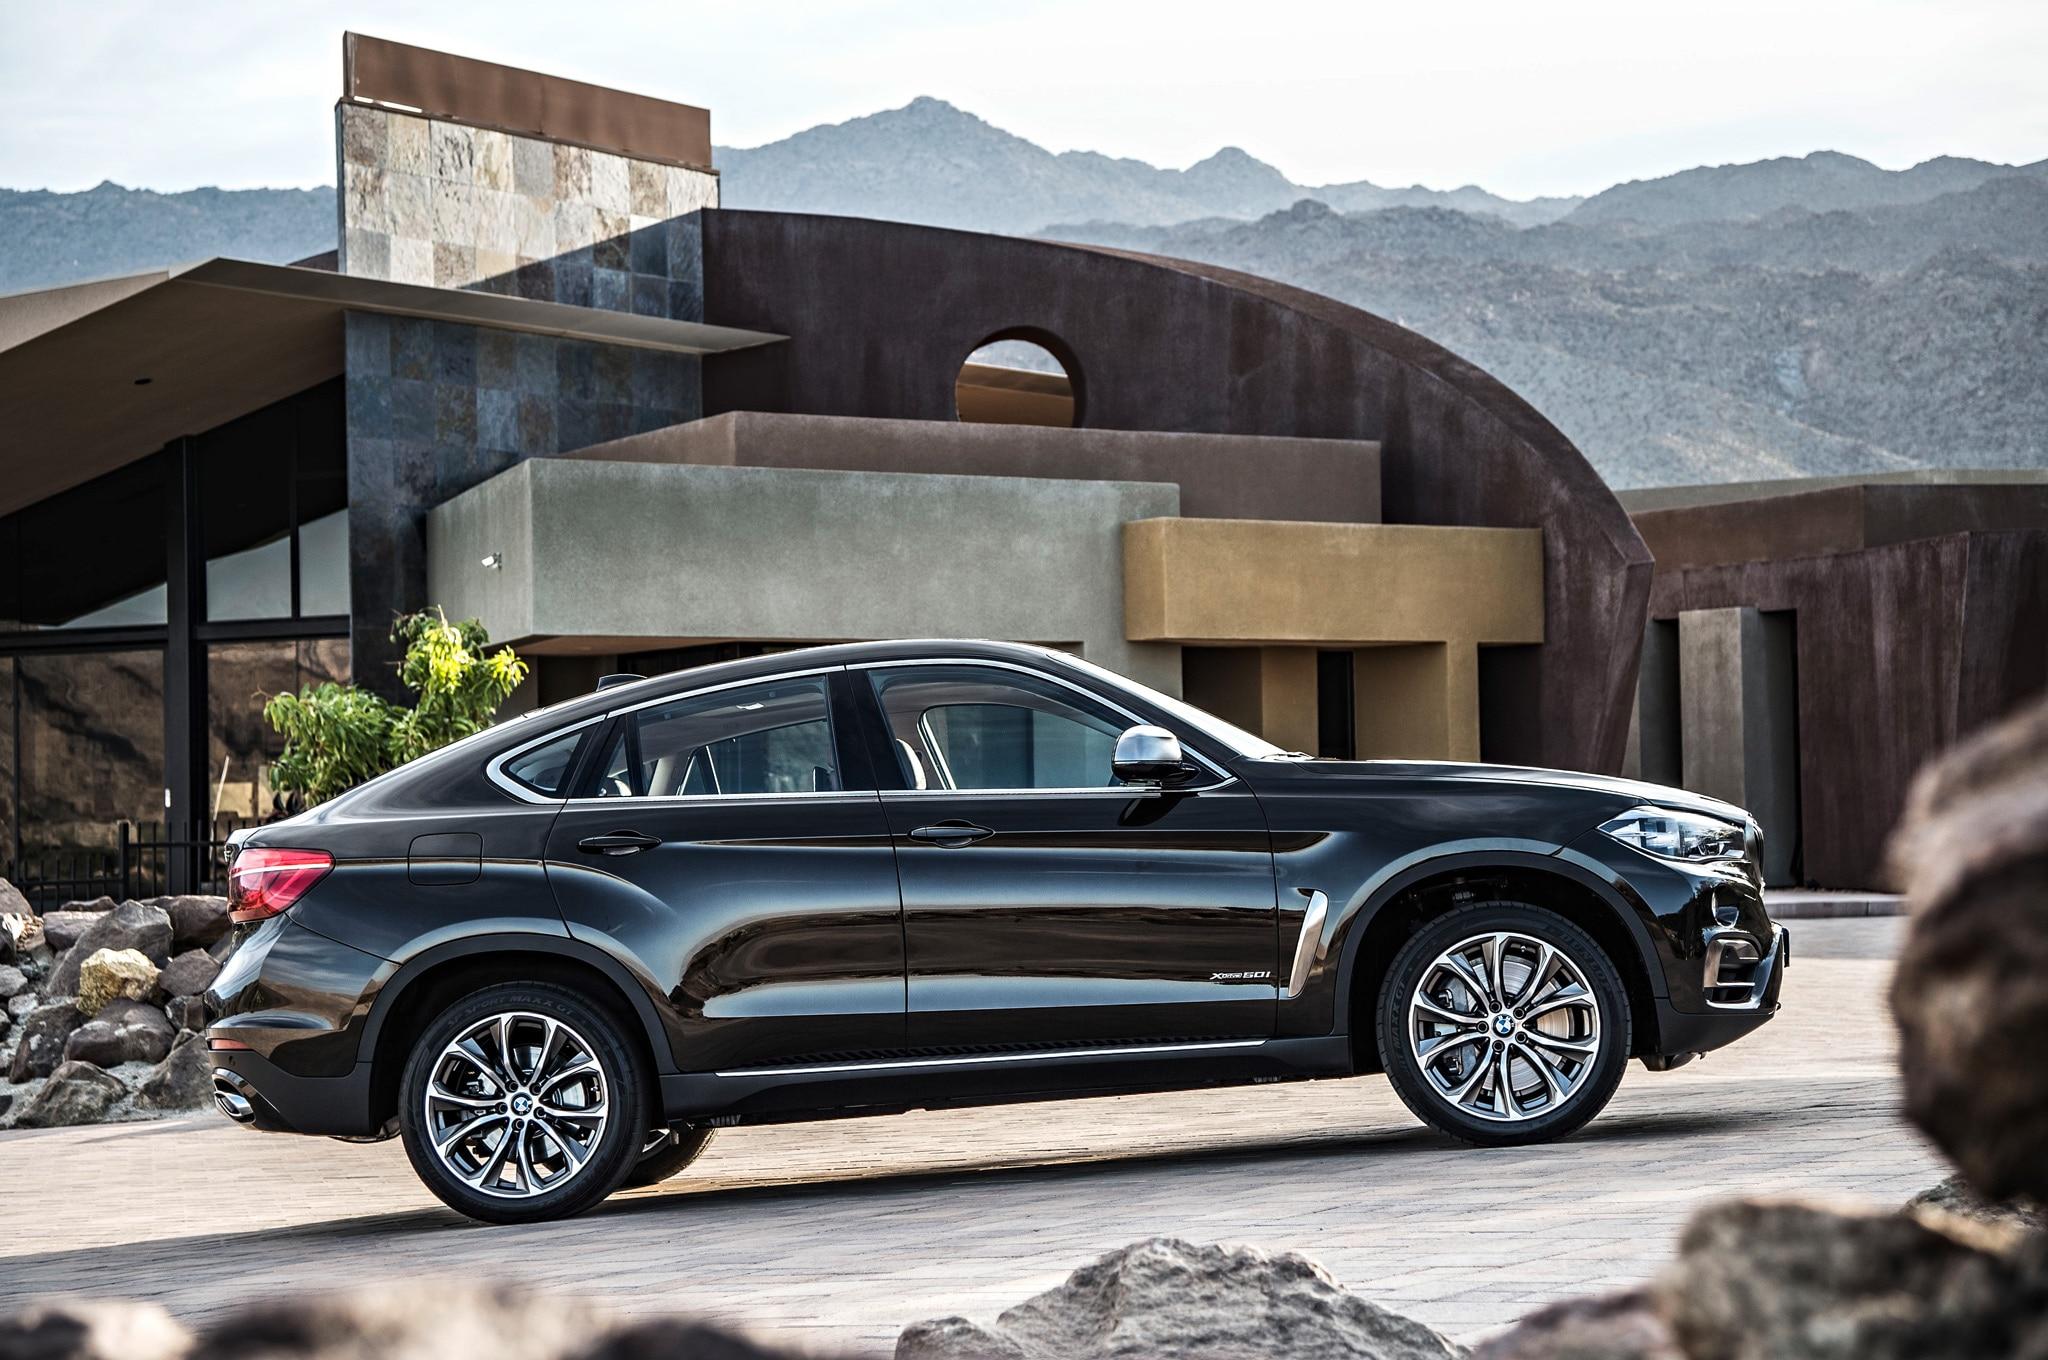 2015 Bmw X6 Updated Adds Rear Wheel Drive Model Automobile Magazine